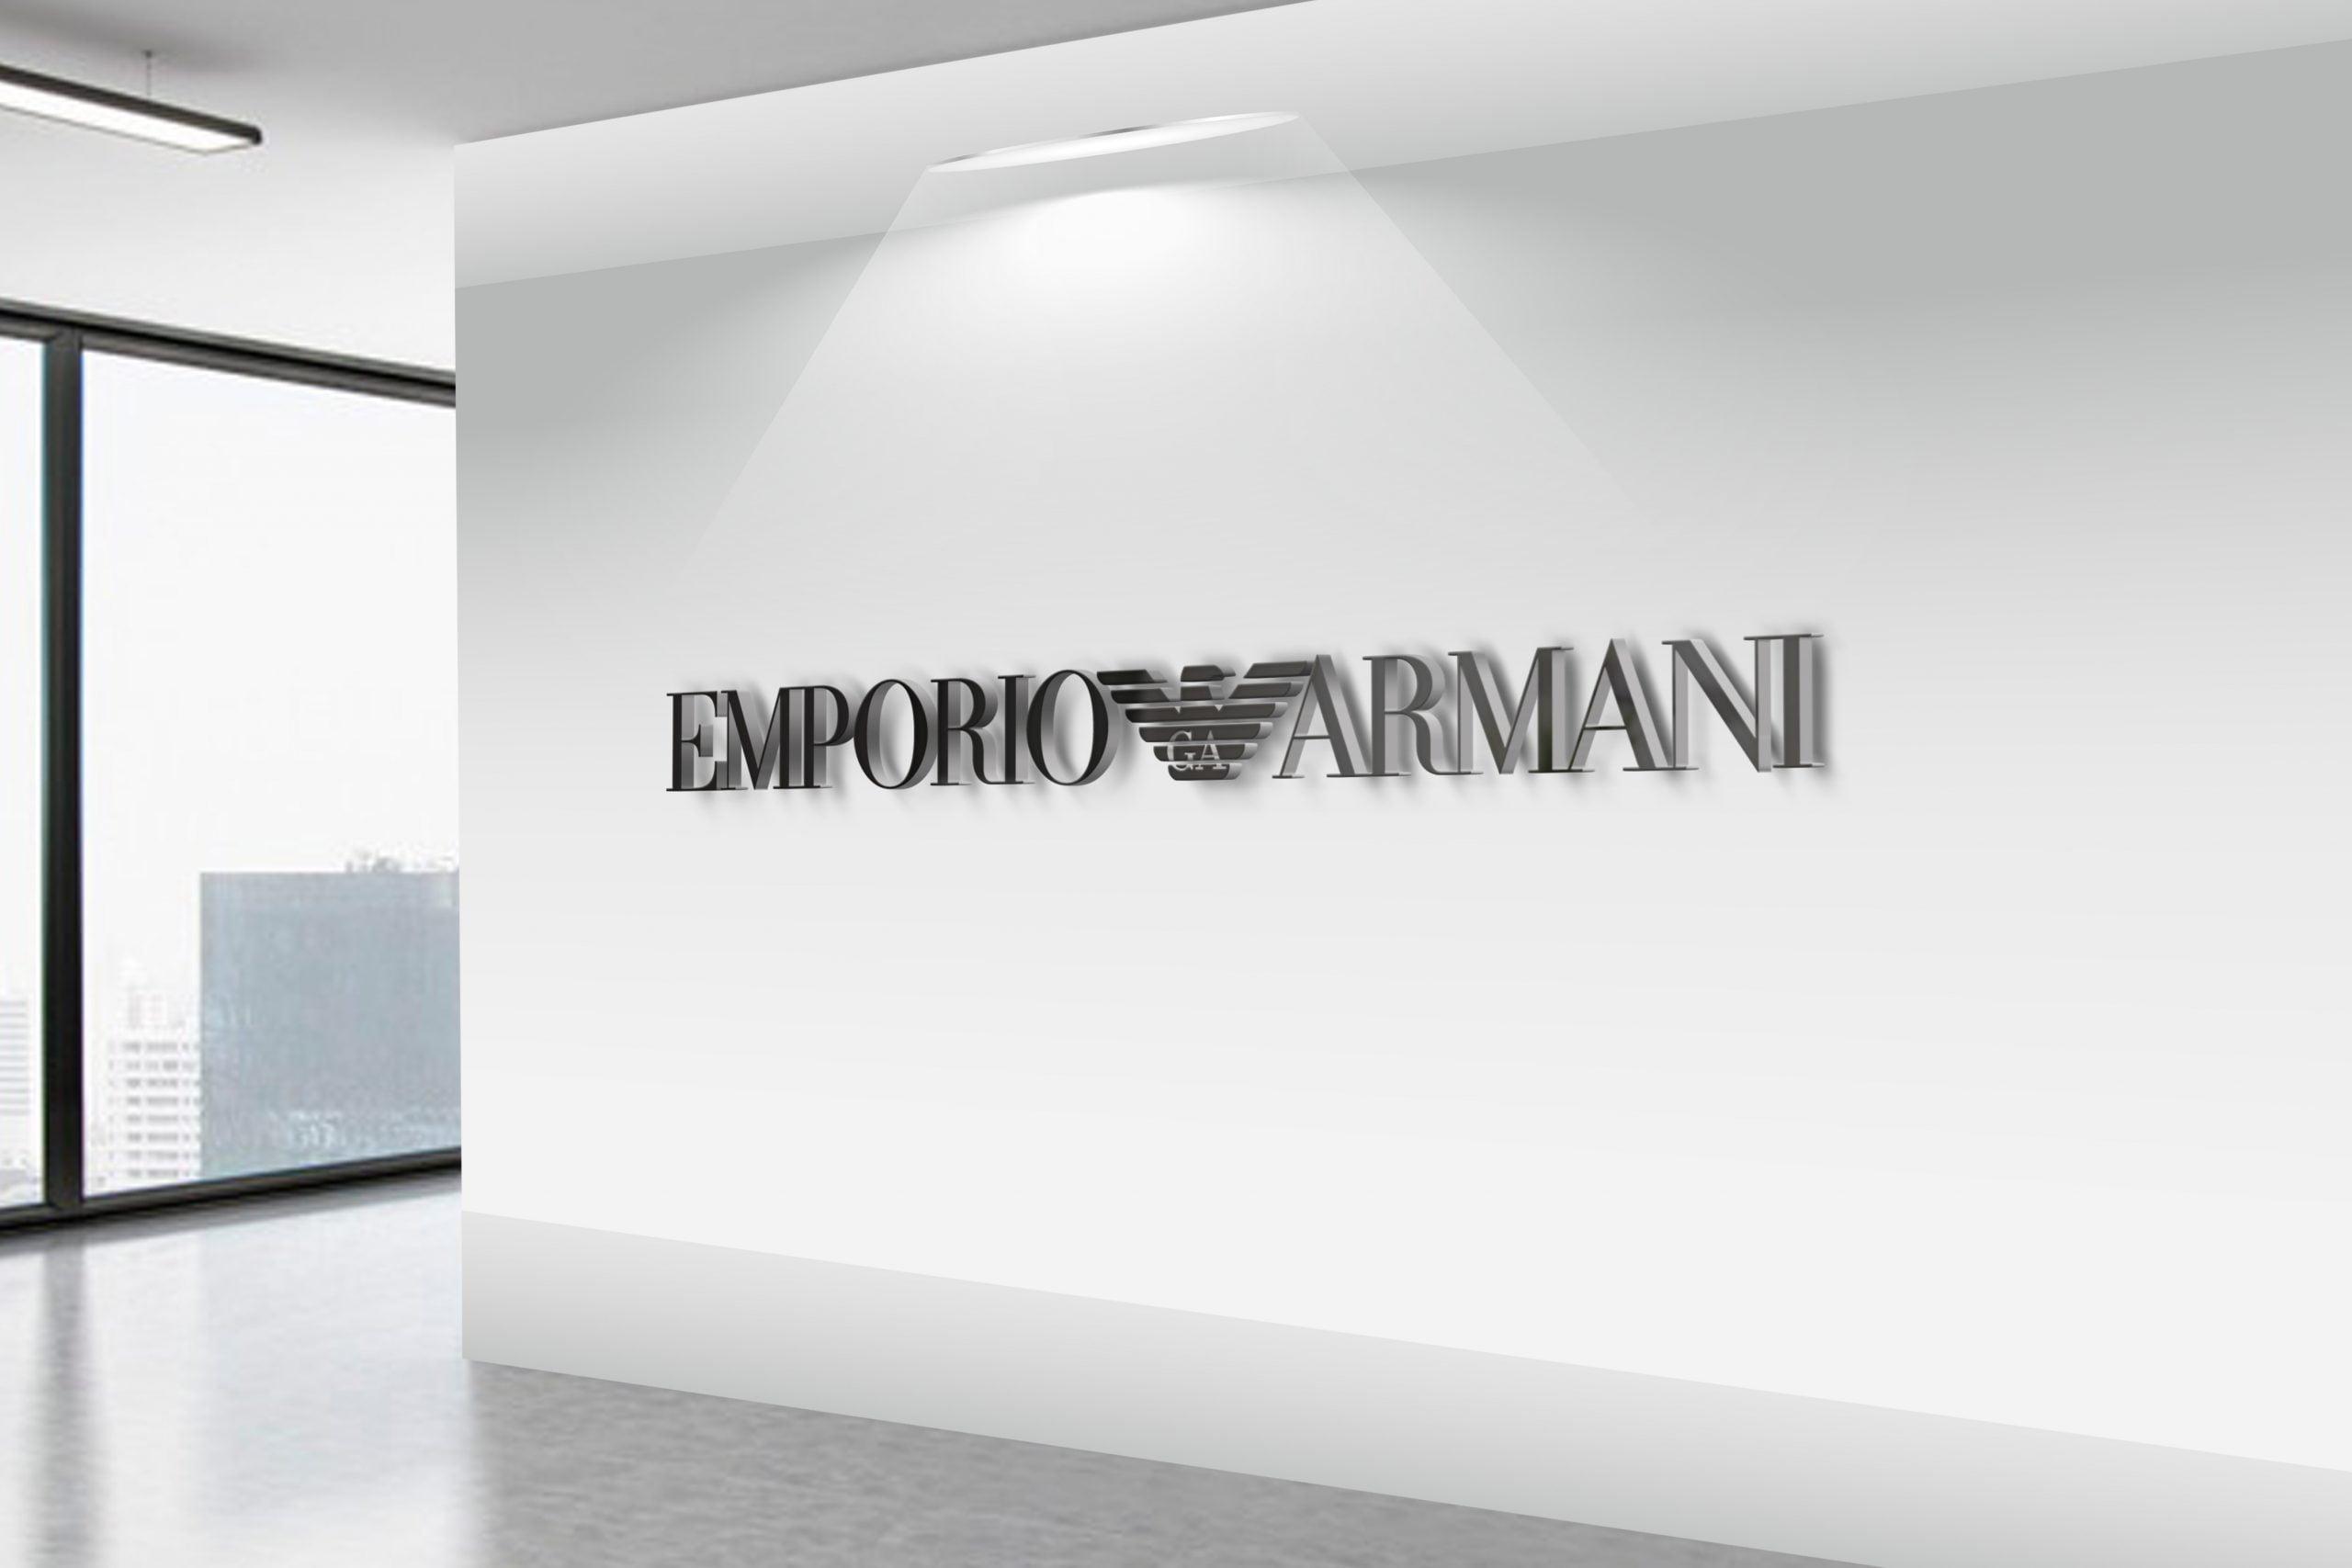 Emporio-Armani-3D-Wall-Logo-MockUp